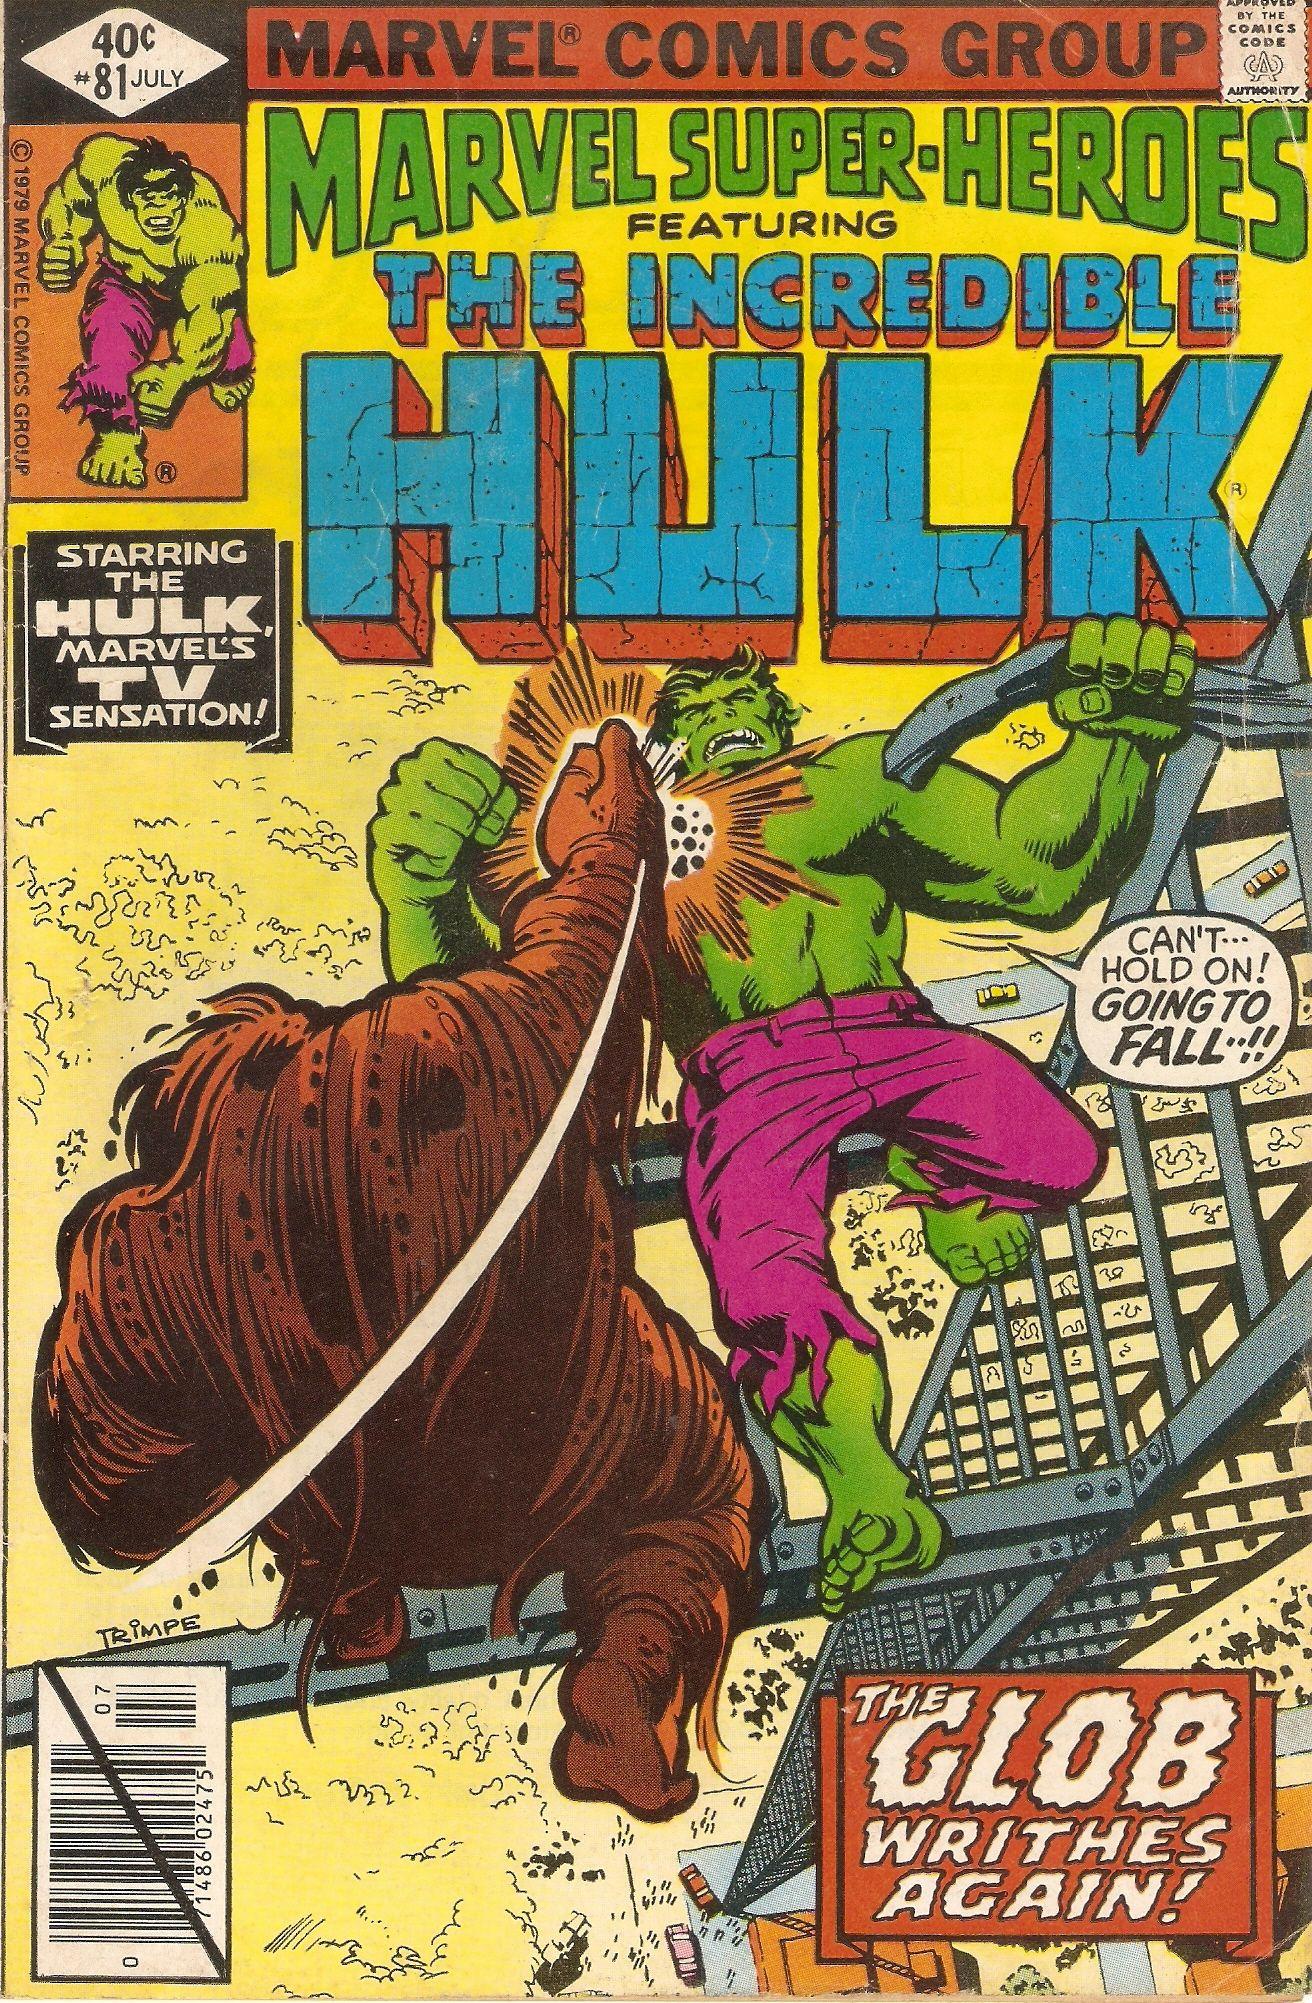 Collectibles Comics 7.5 Beautiful Incredible Hulk #160 Vf